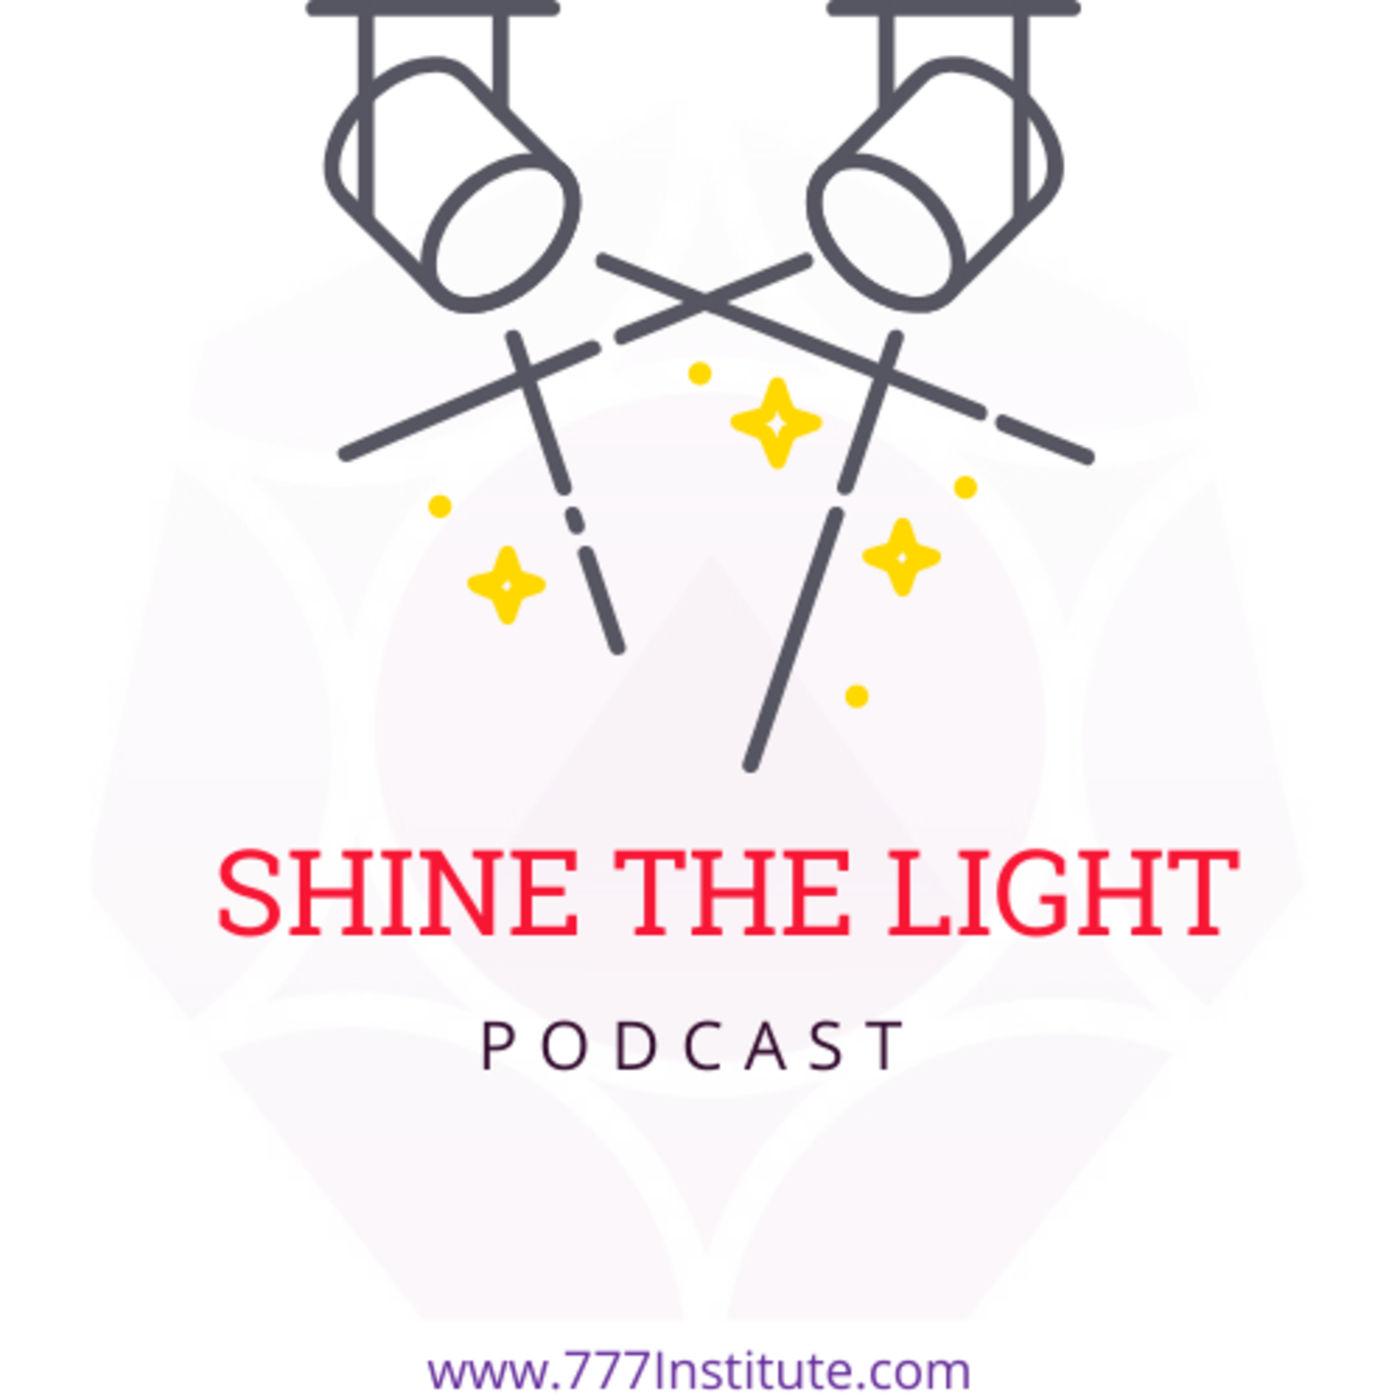 Shine The Light